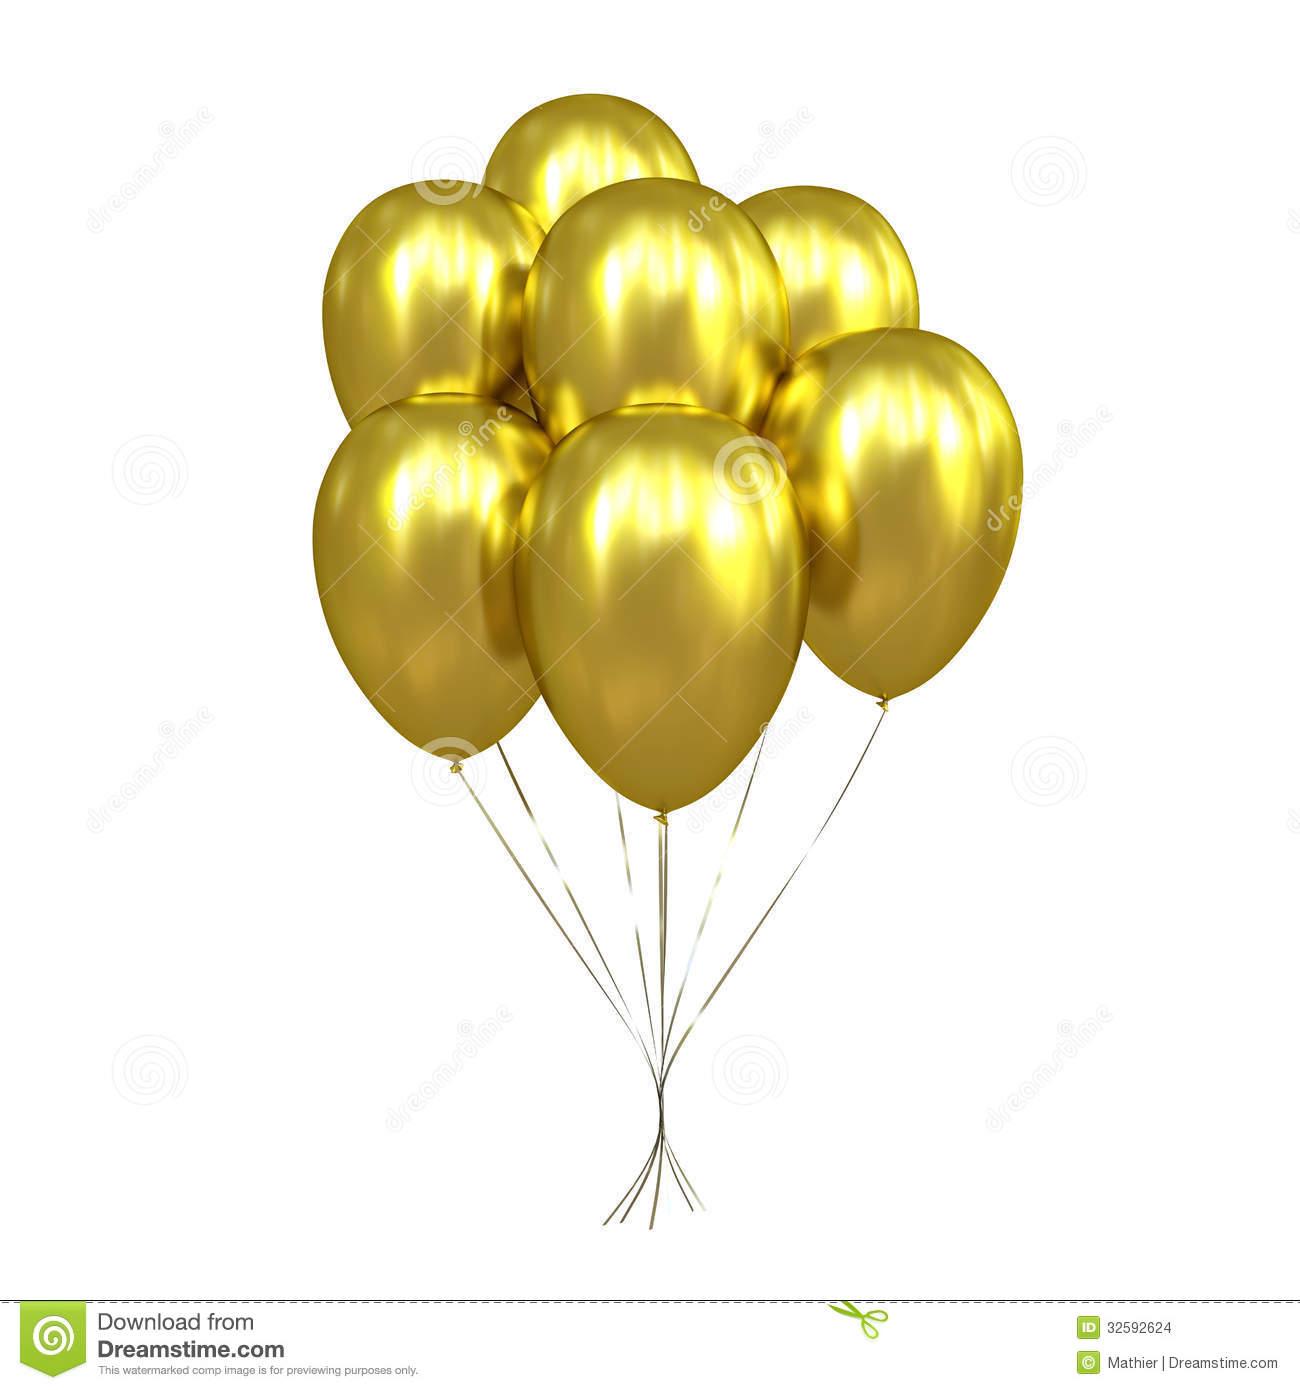 Gold balloons clipart transparent background png clip transparent 7 Golden Balloons Stock Images - Image: 32592624 clip transparent